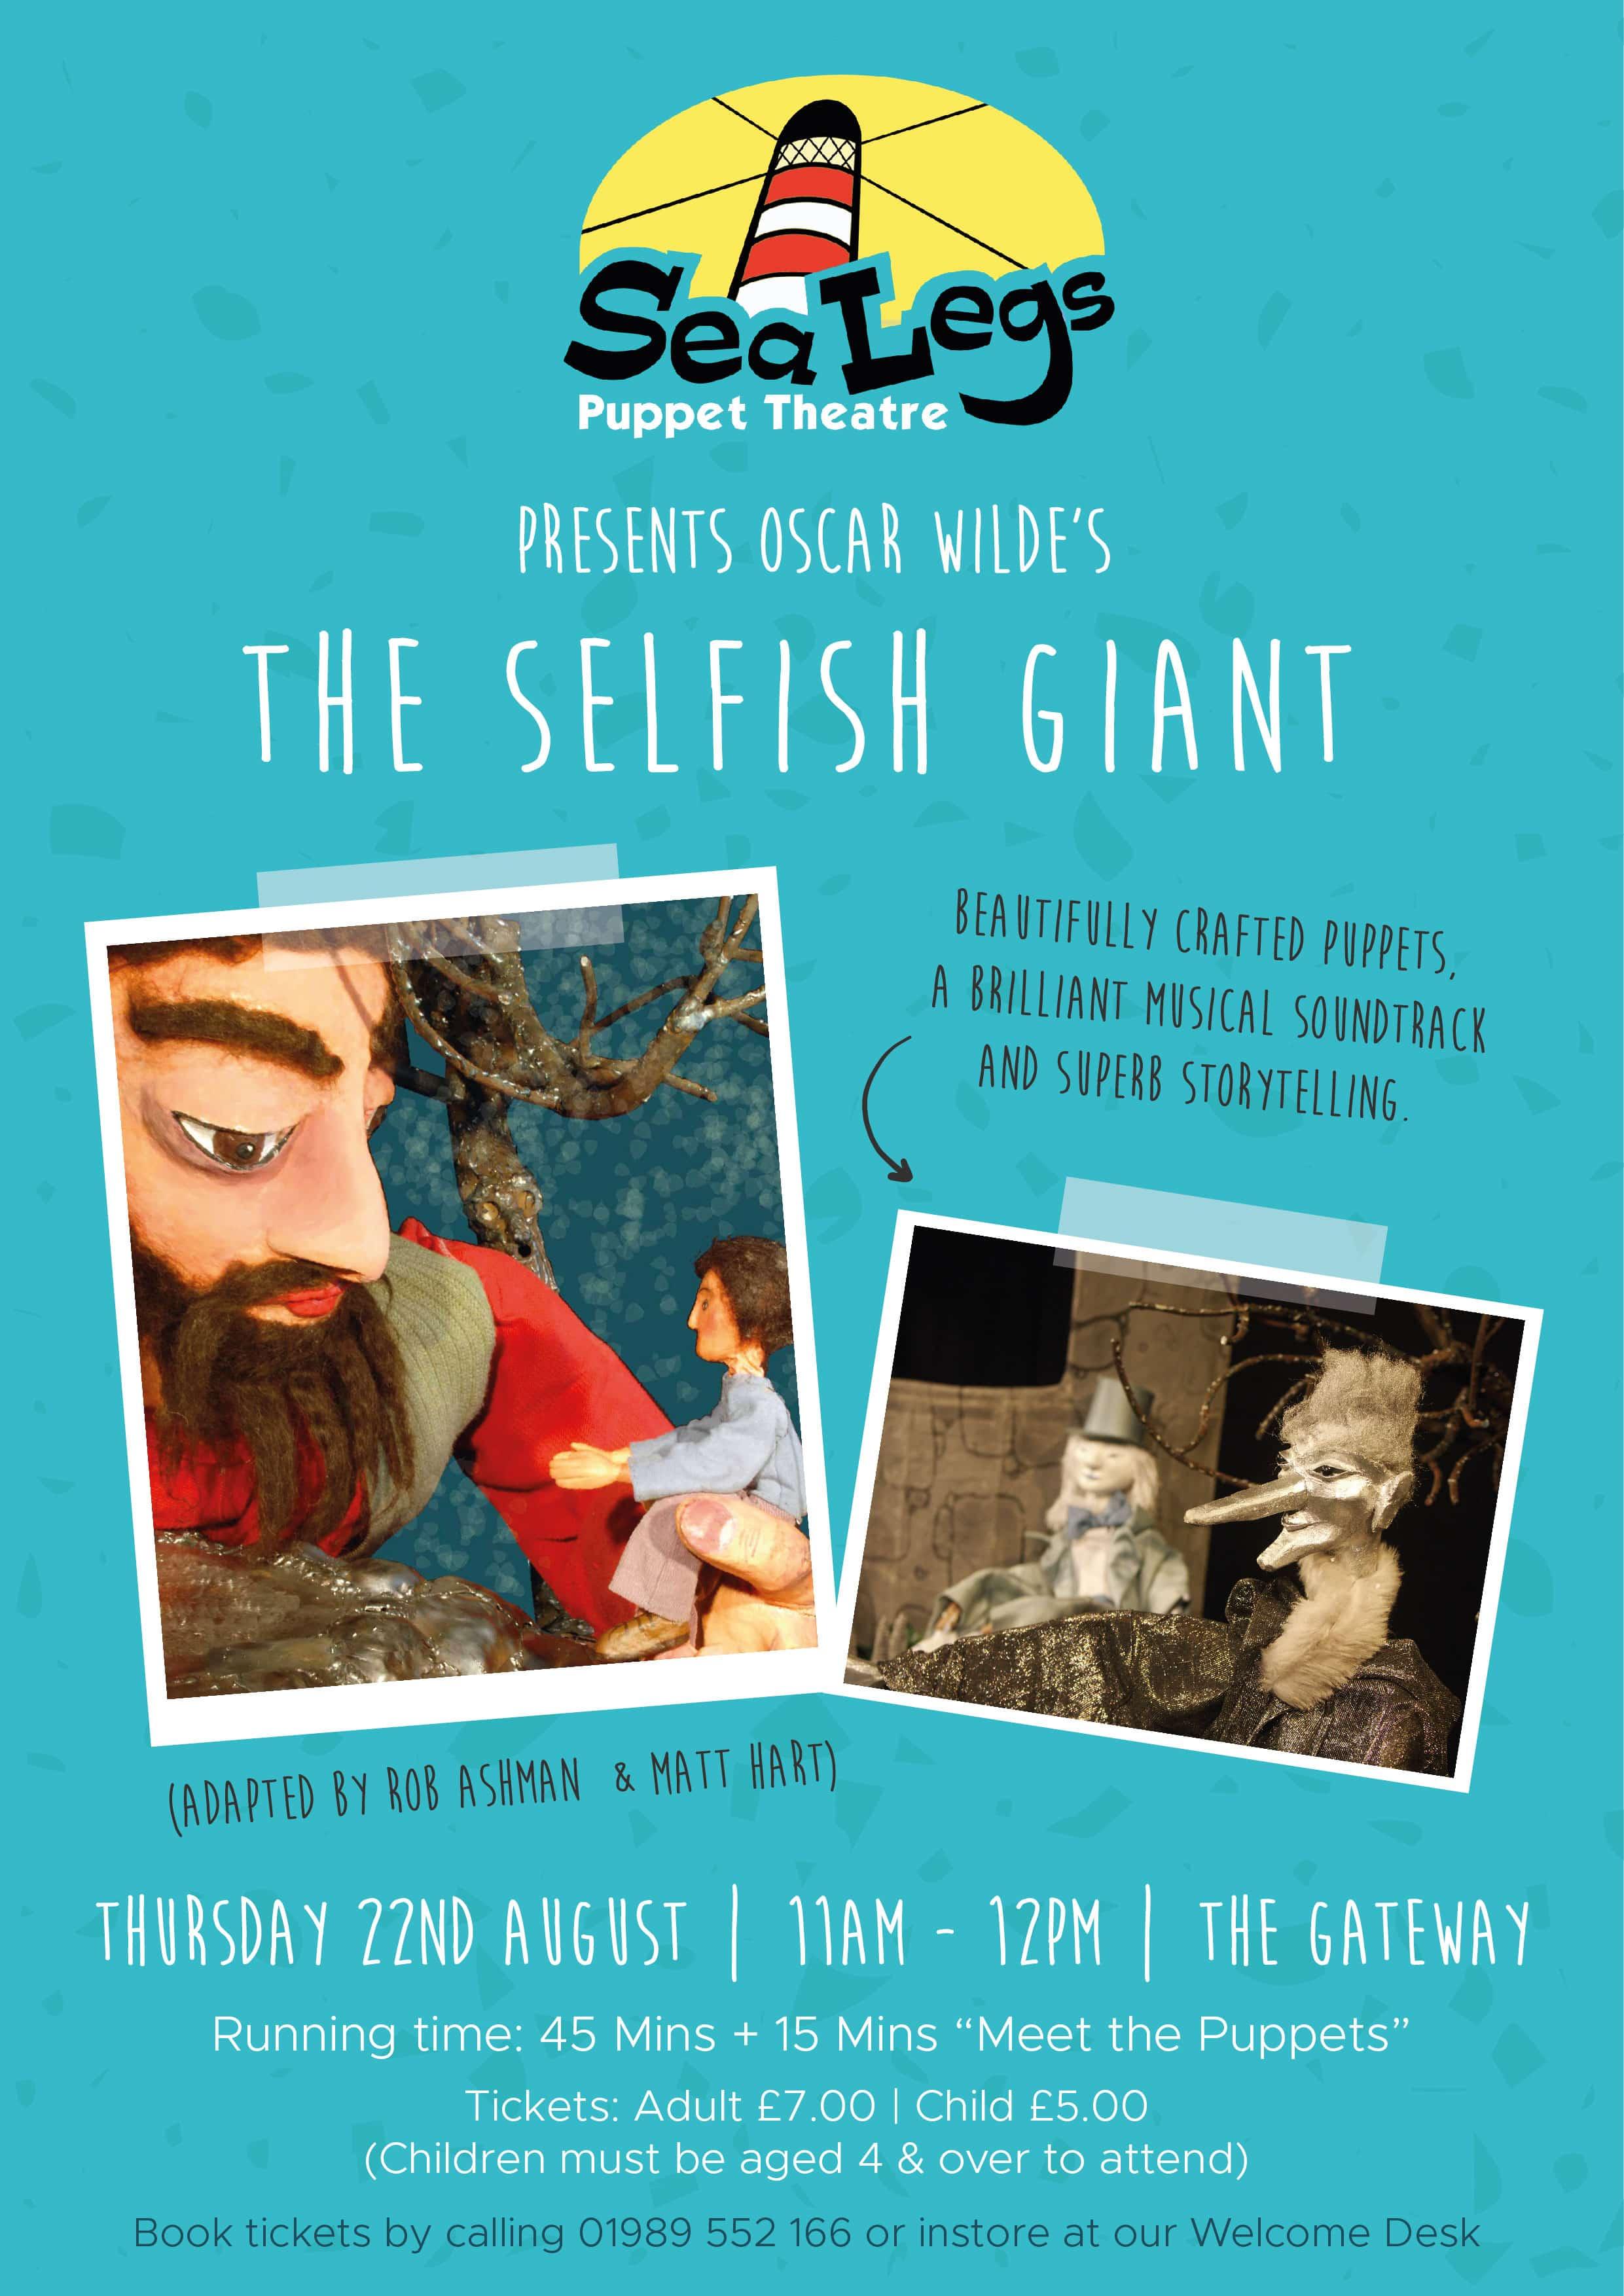 Sea leg Puppet Theatre